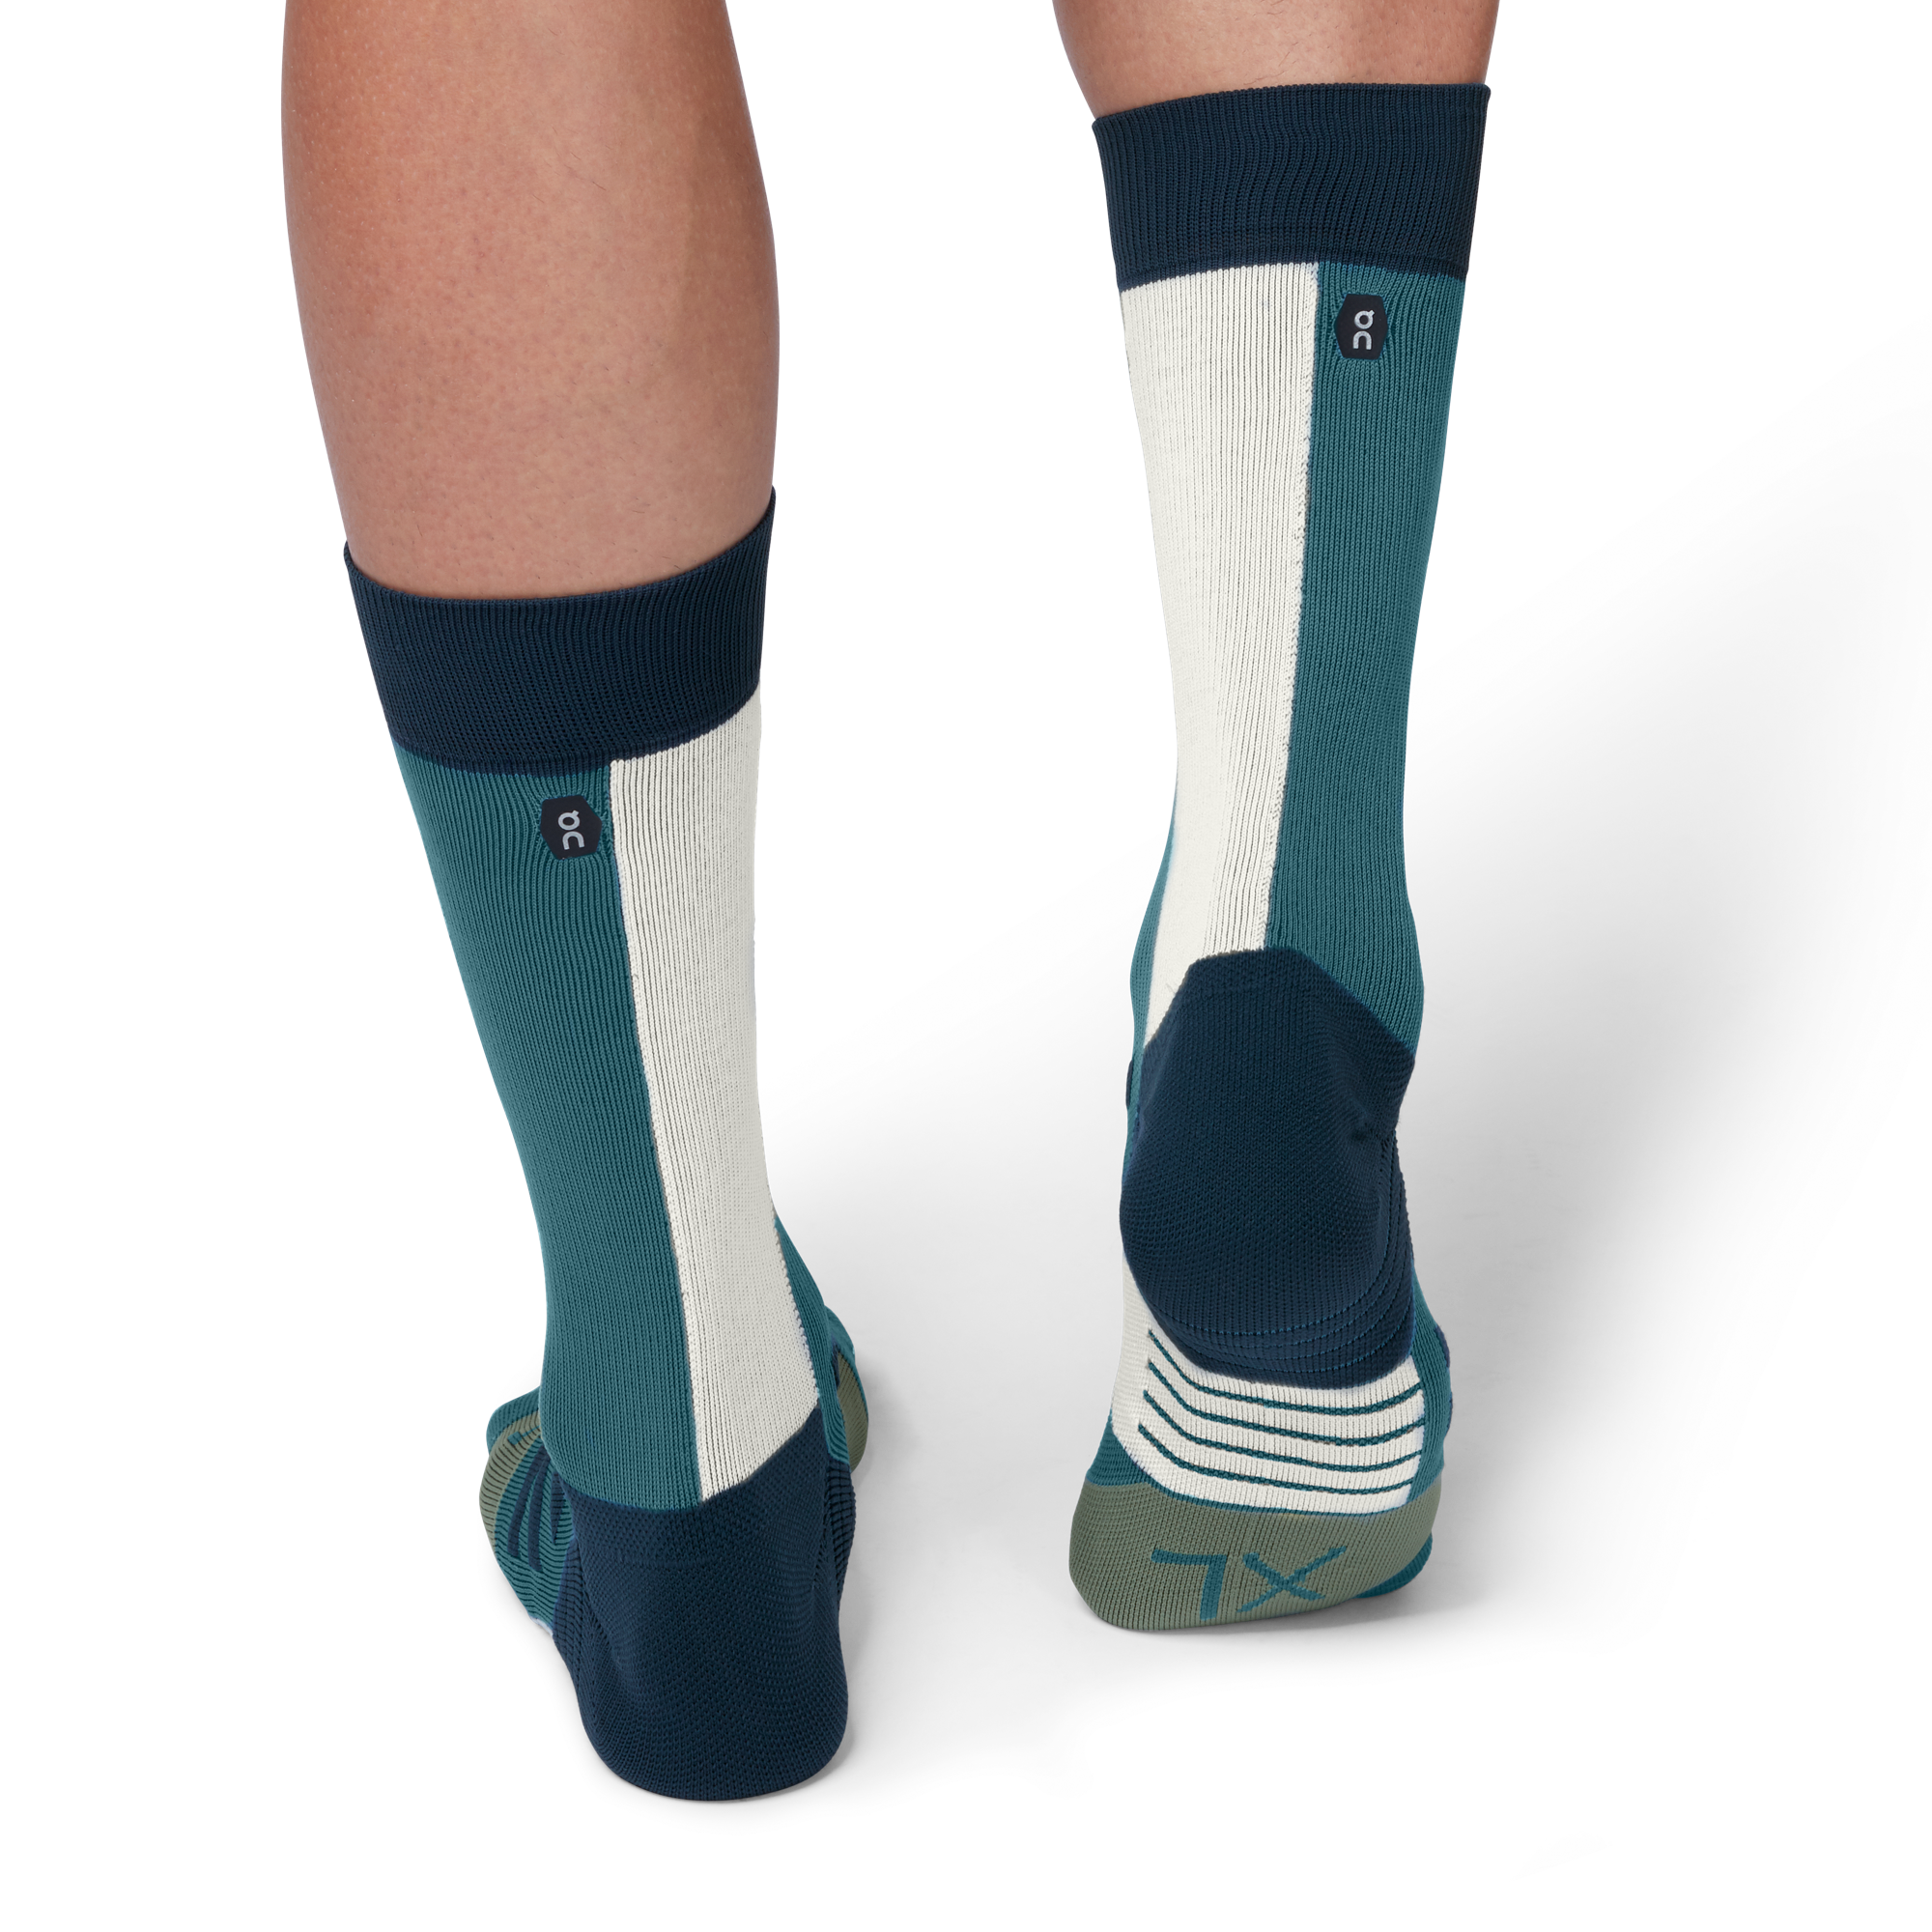 New Peter Storm Lightweight Outdoor Sock Footwear Accessory